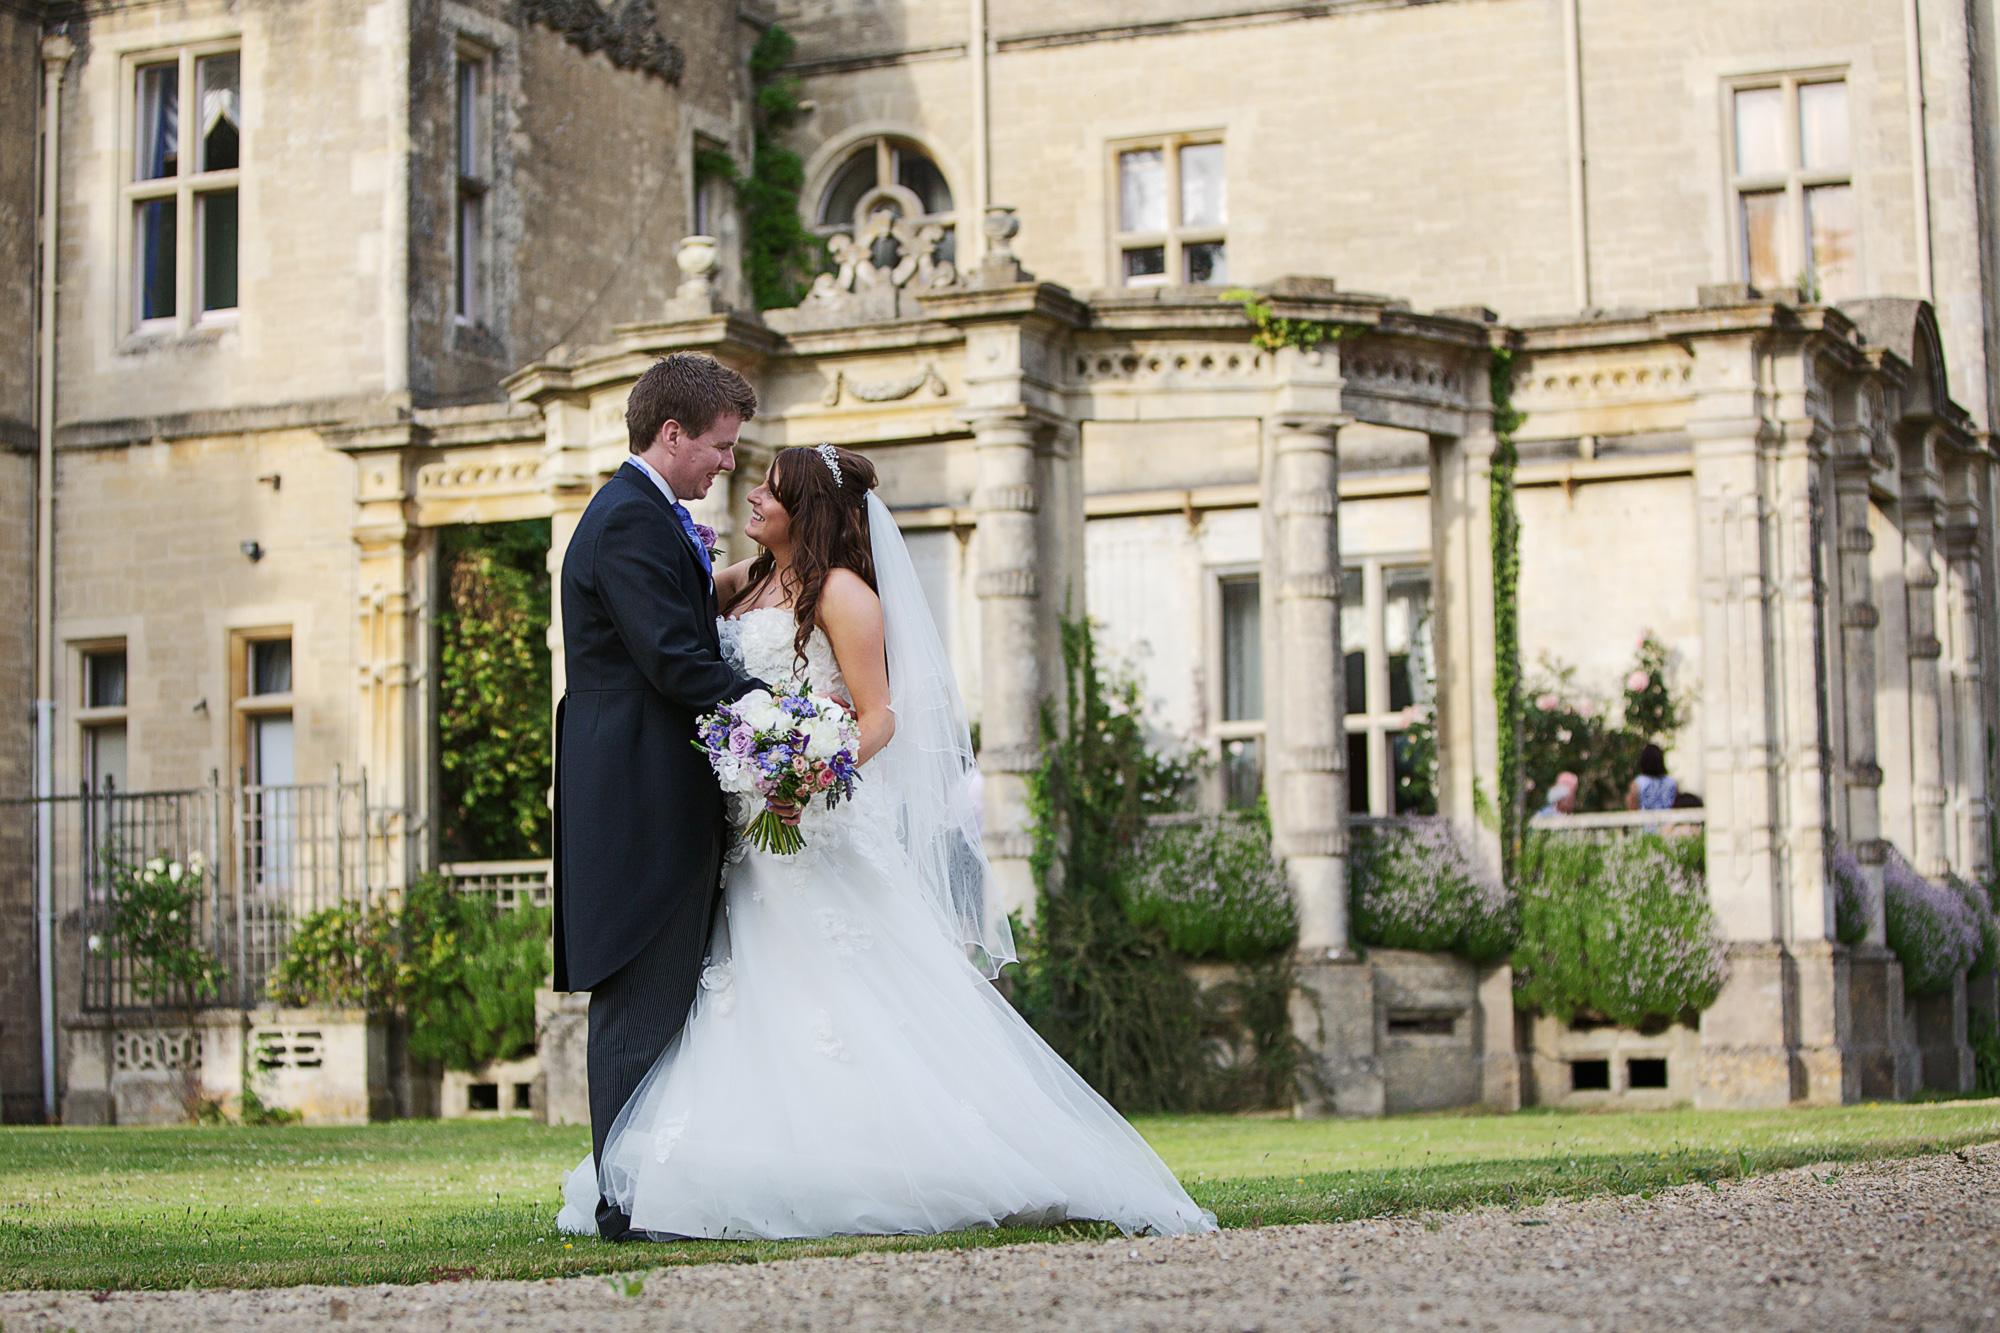 Adam_Hillier_Wedding_Photographer_Newbury_Berkshire_0 (7).jpg